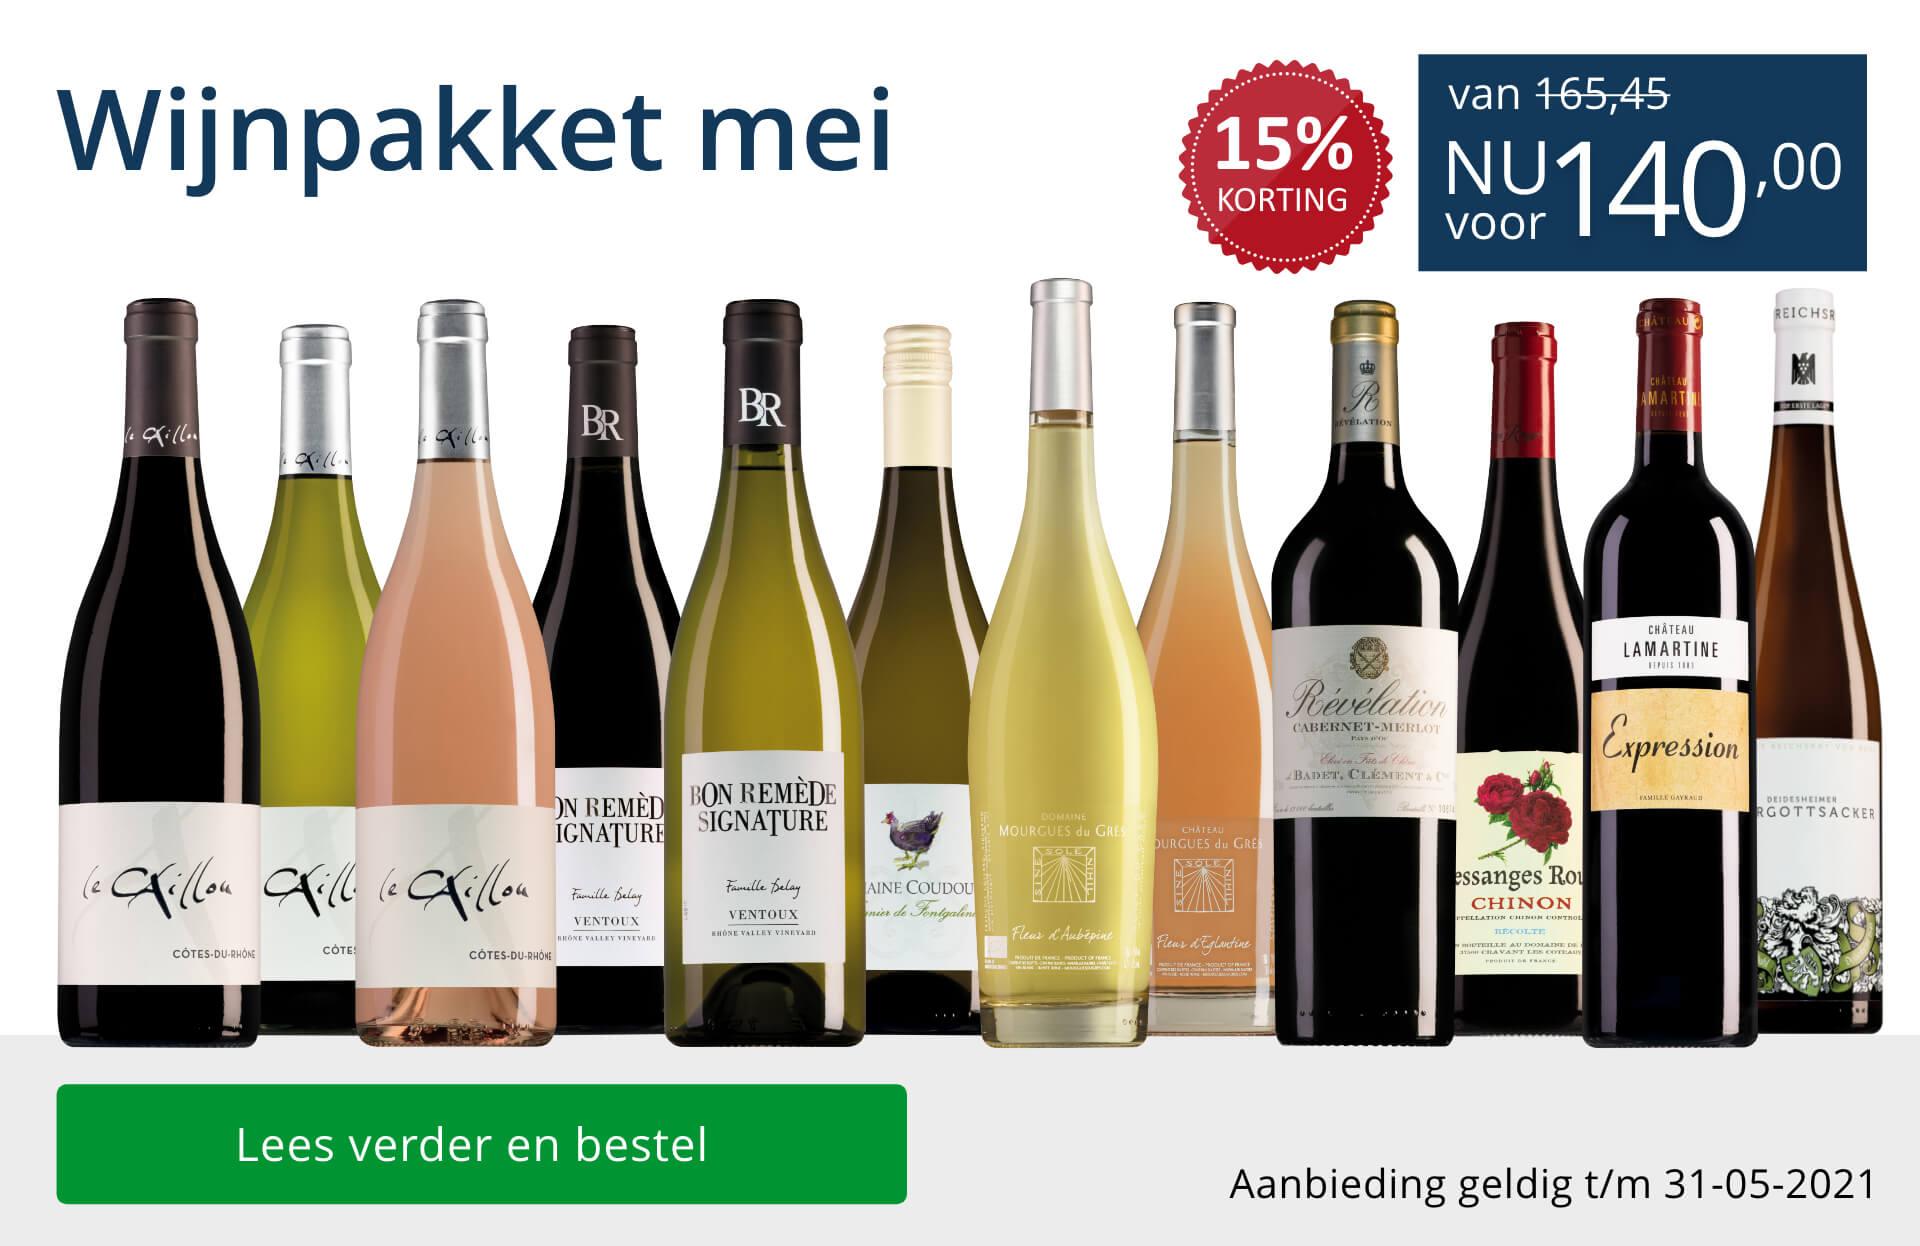 Wijnpakket wijnbericht mei 2021 (140,00) - blauw